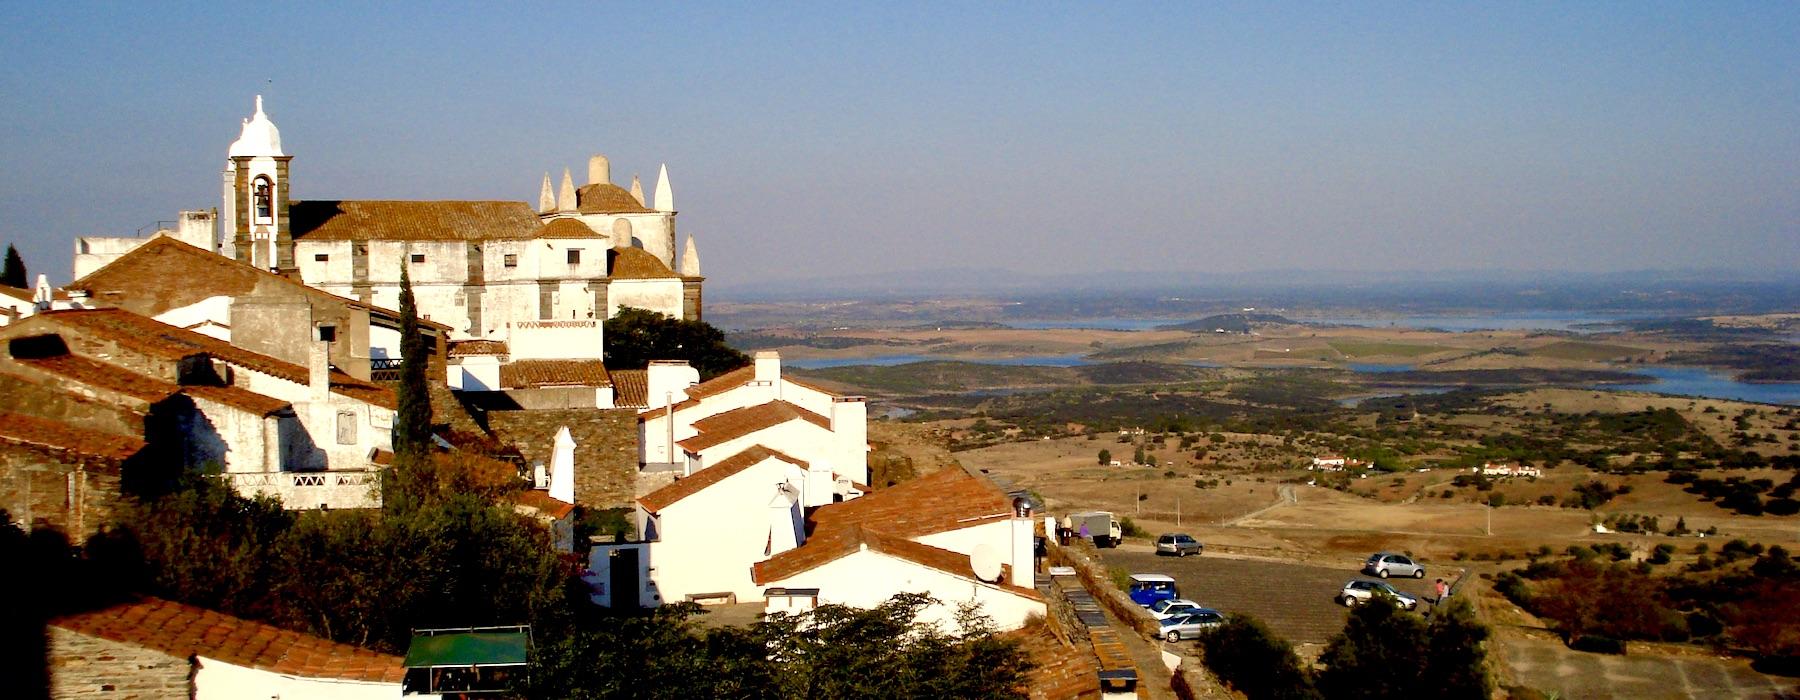 Views of Monsaraz roof tops and alqueva lake